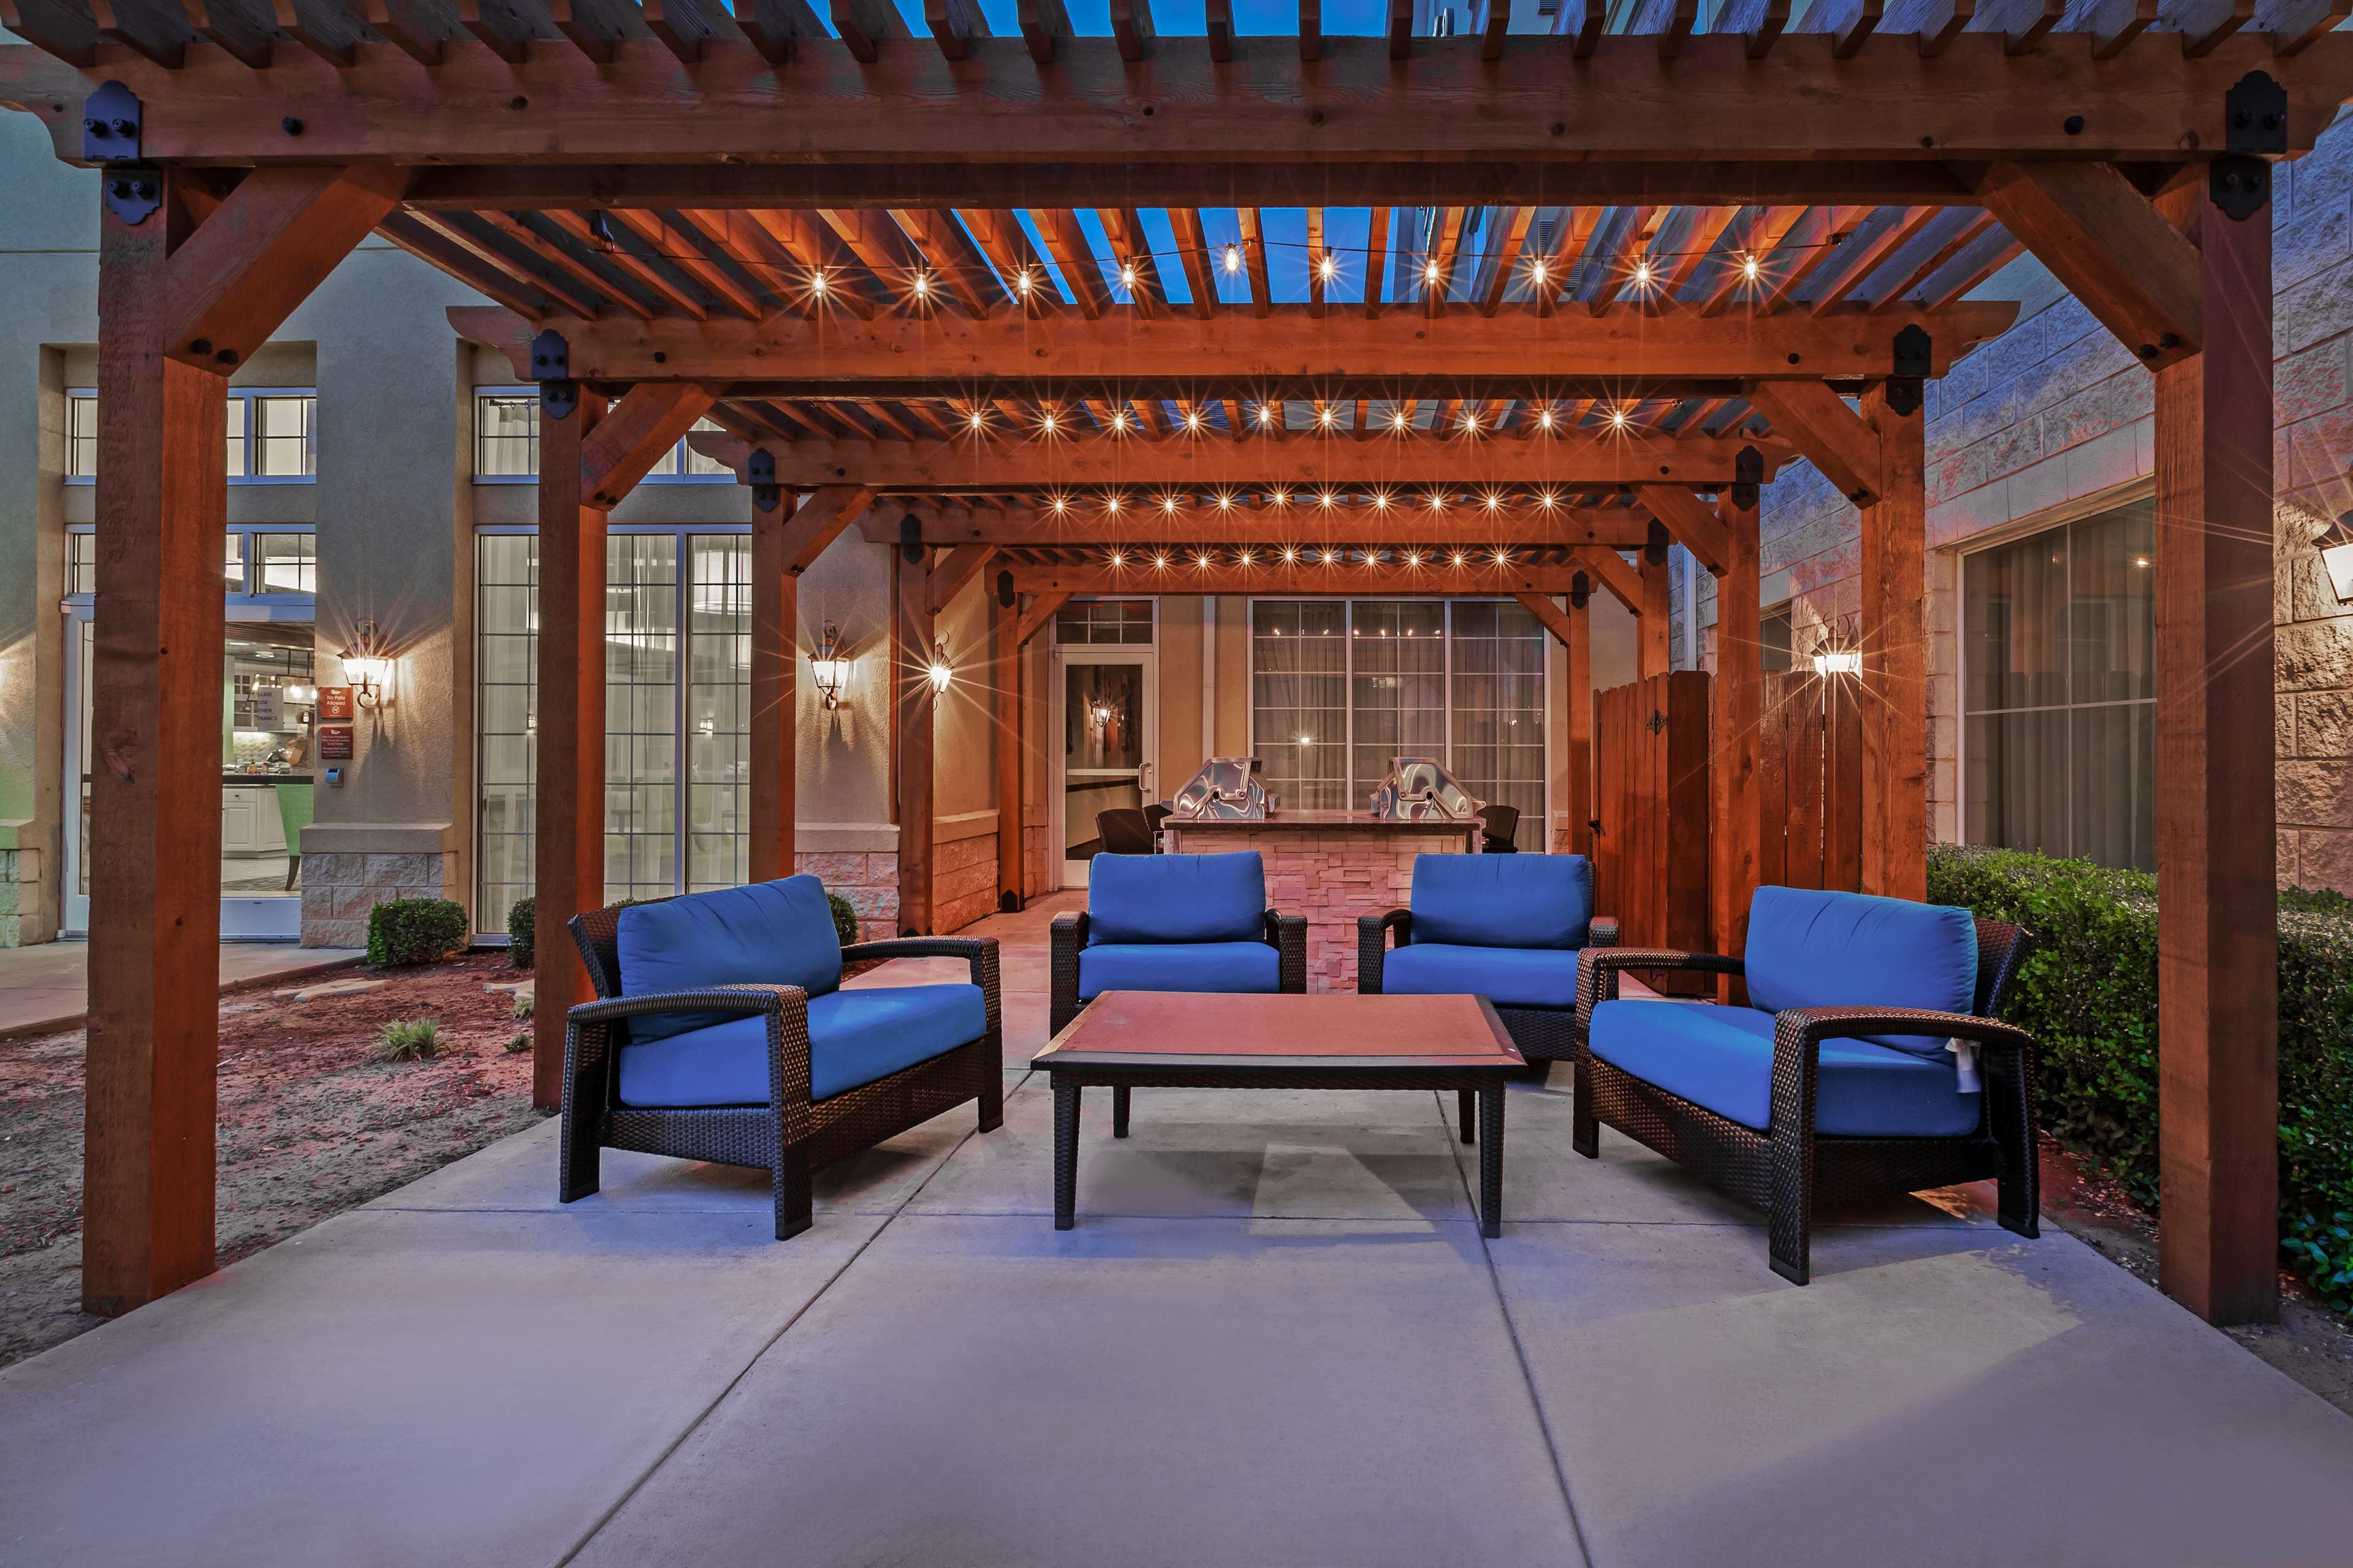 Homewood Suites by Hilton Wichita Falls image 4